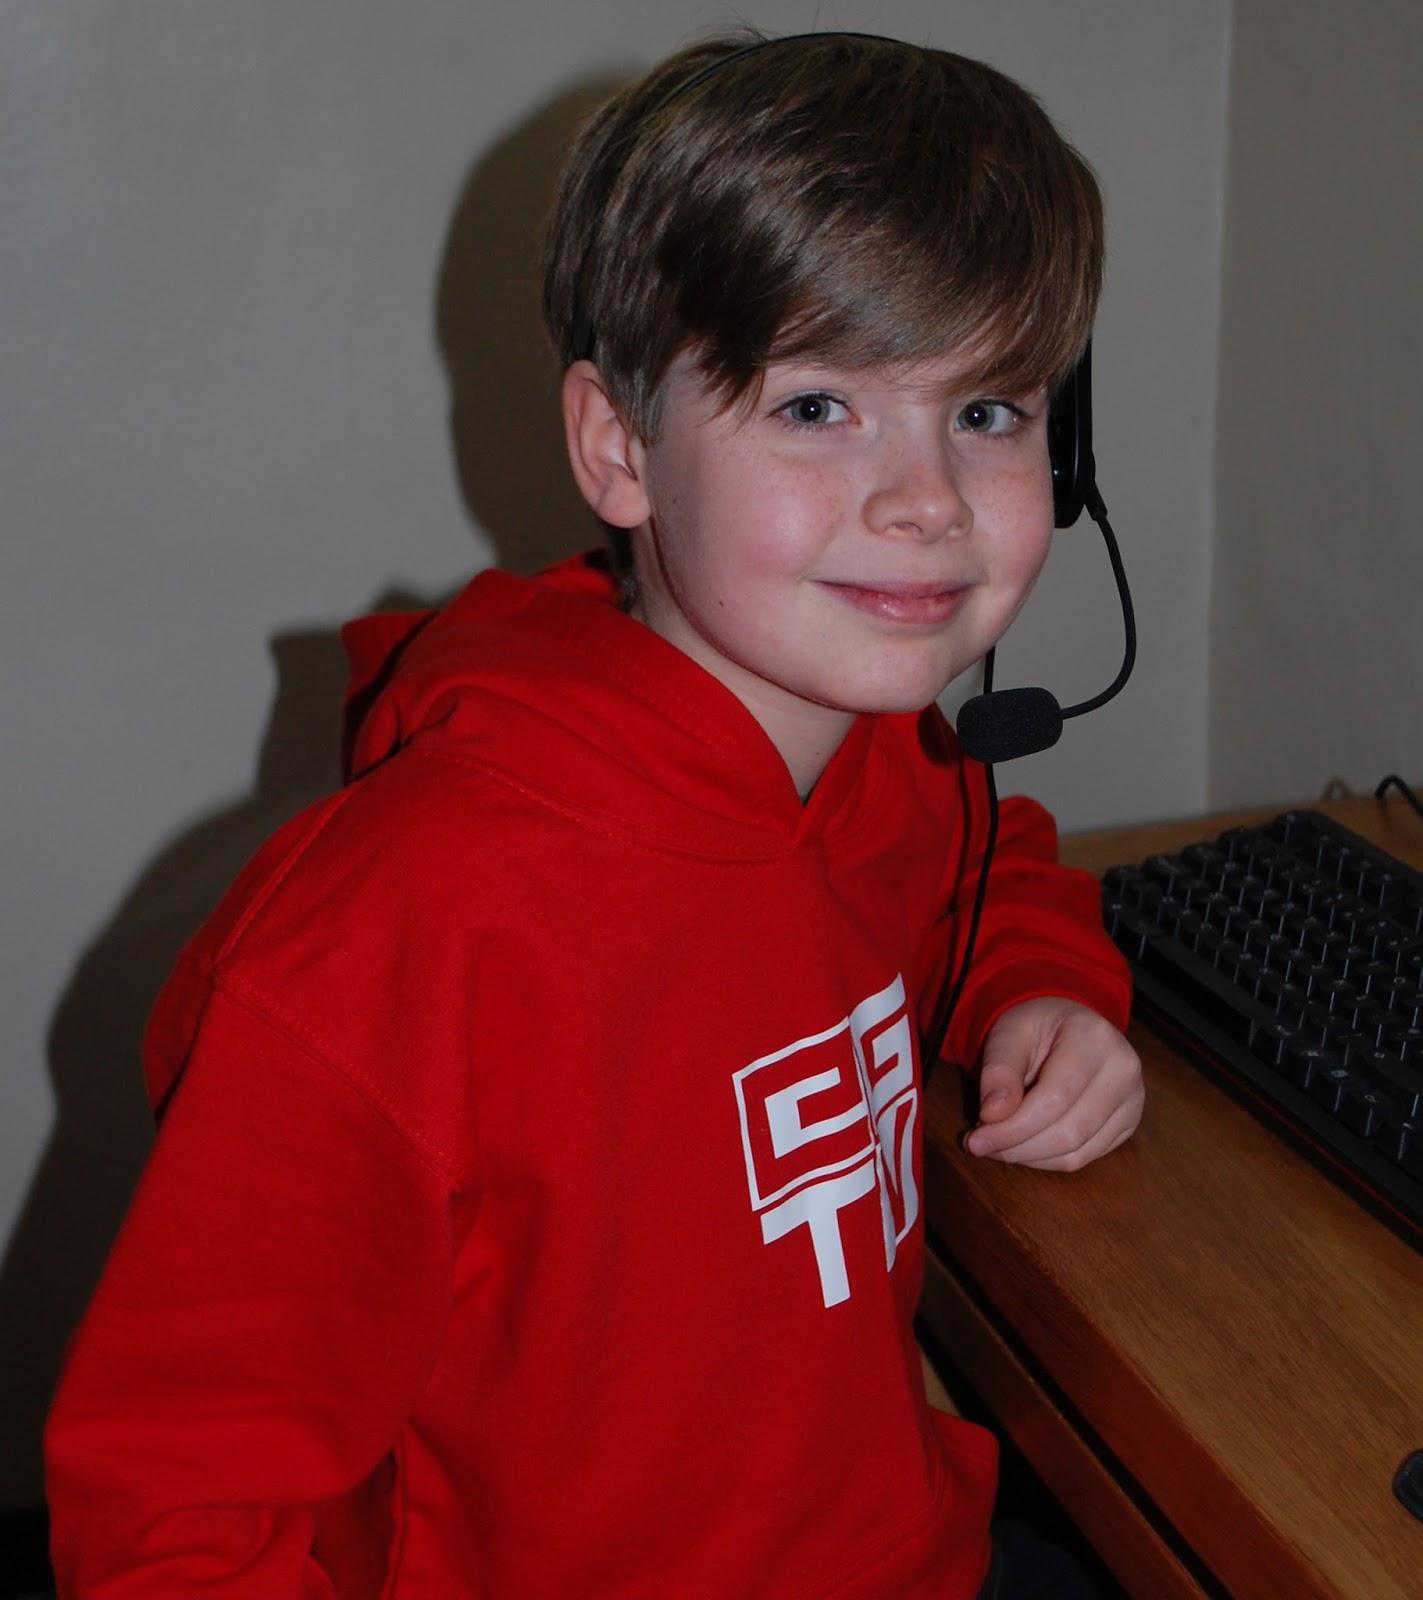 Ethan Gamer Tv Cat Games